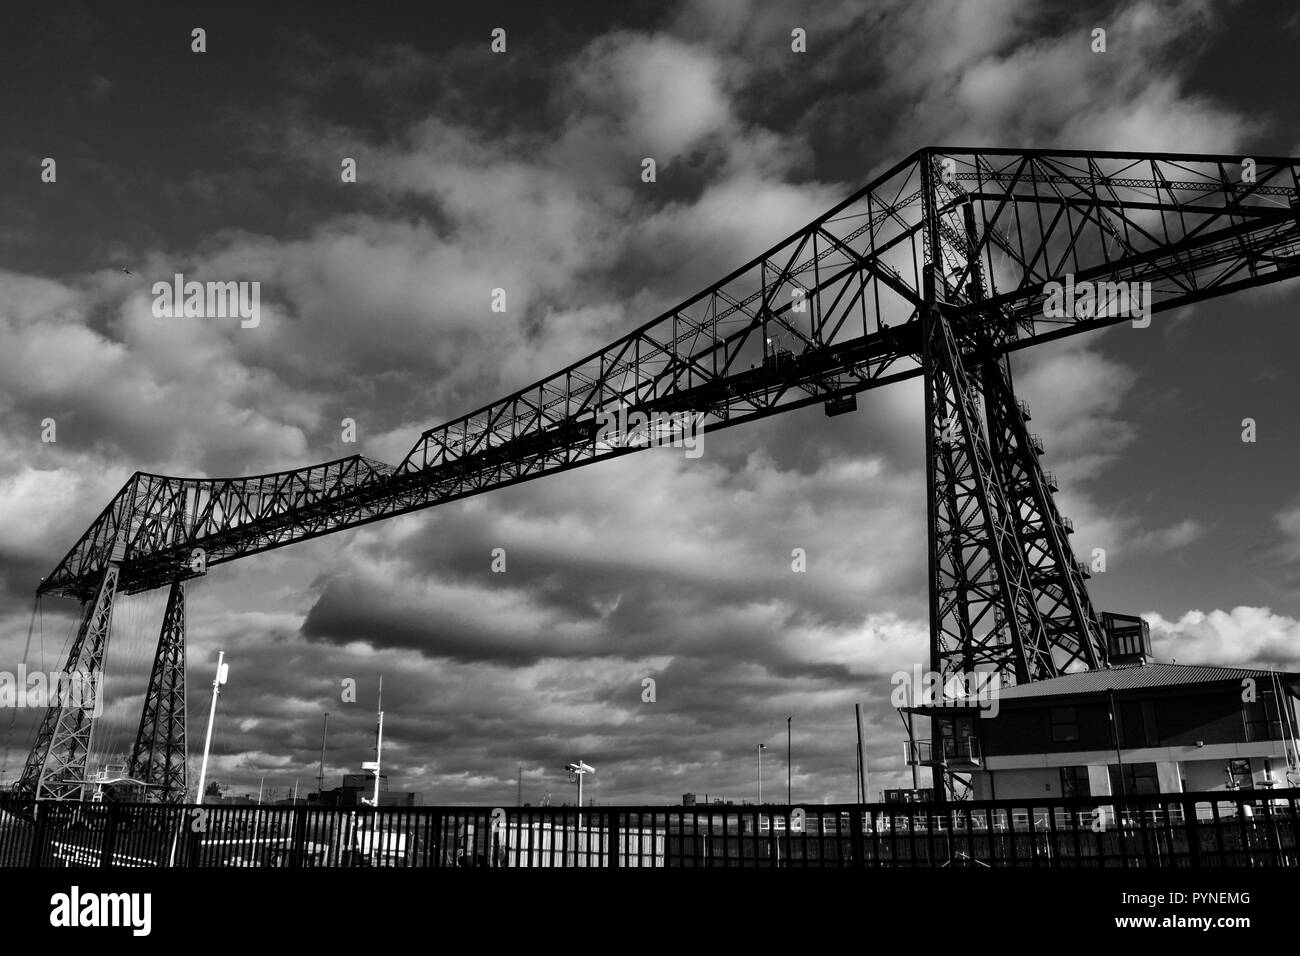 Stunning, moody, black & white image of the stunning Tees Transporter Bridge, Middlesbrough, Cleveland, UK. - Stock Image